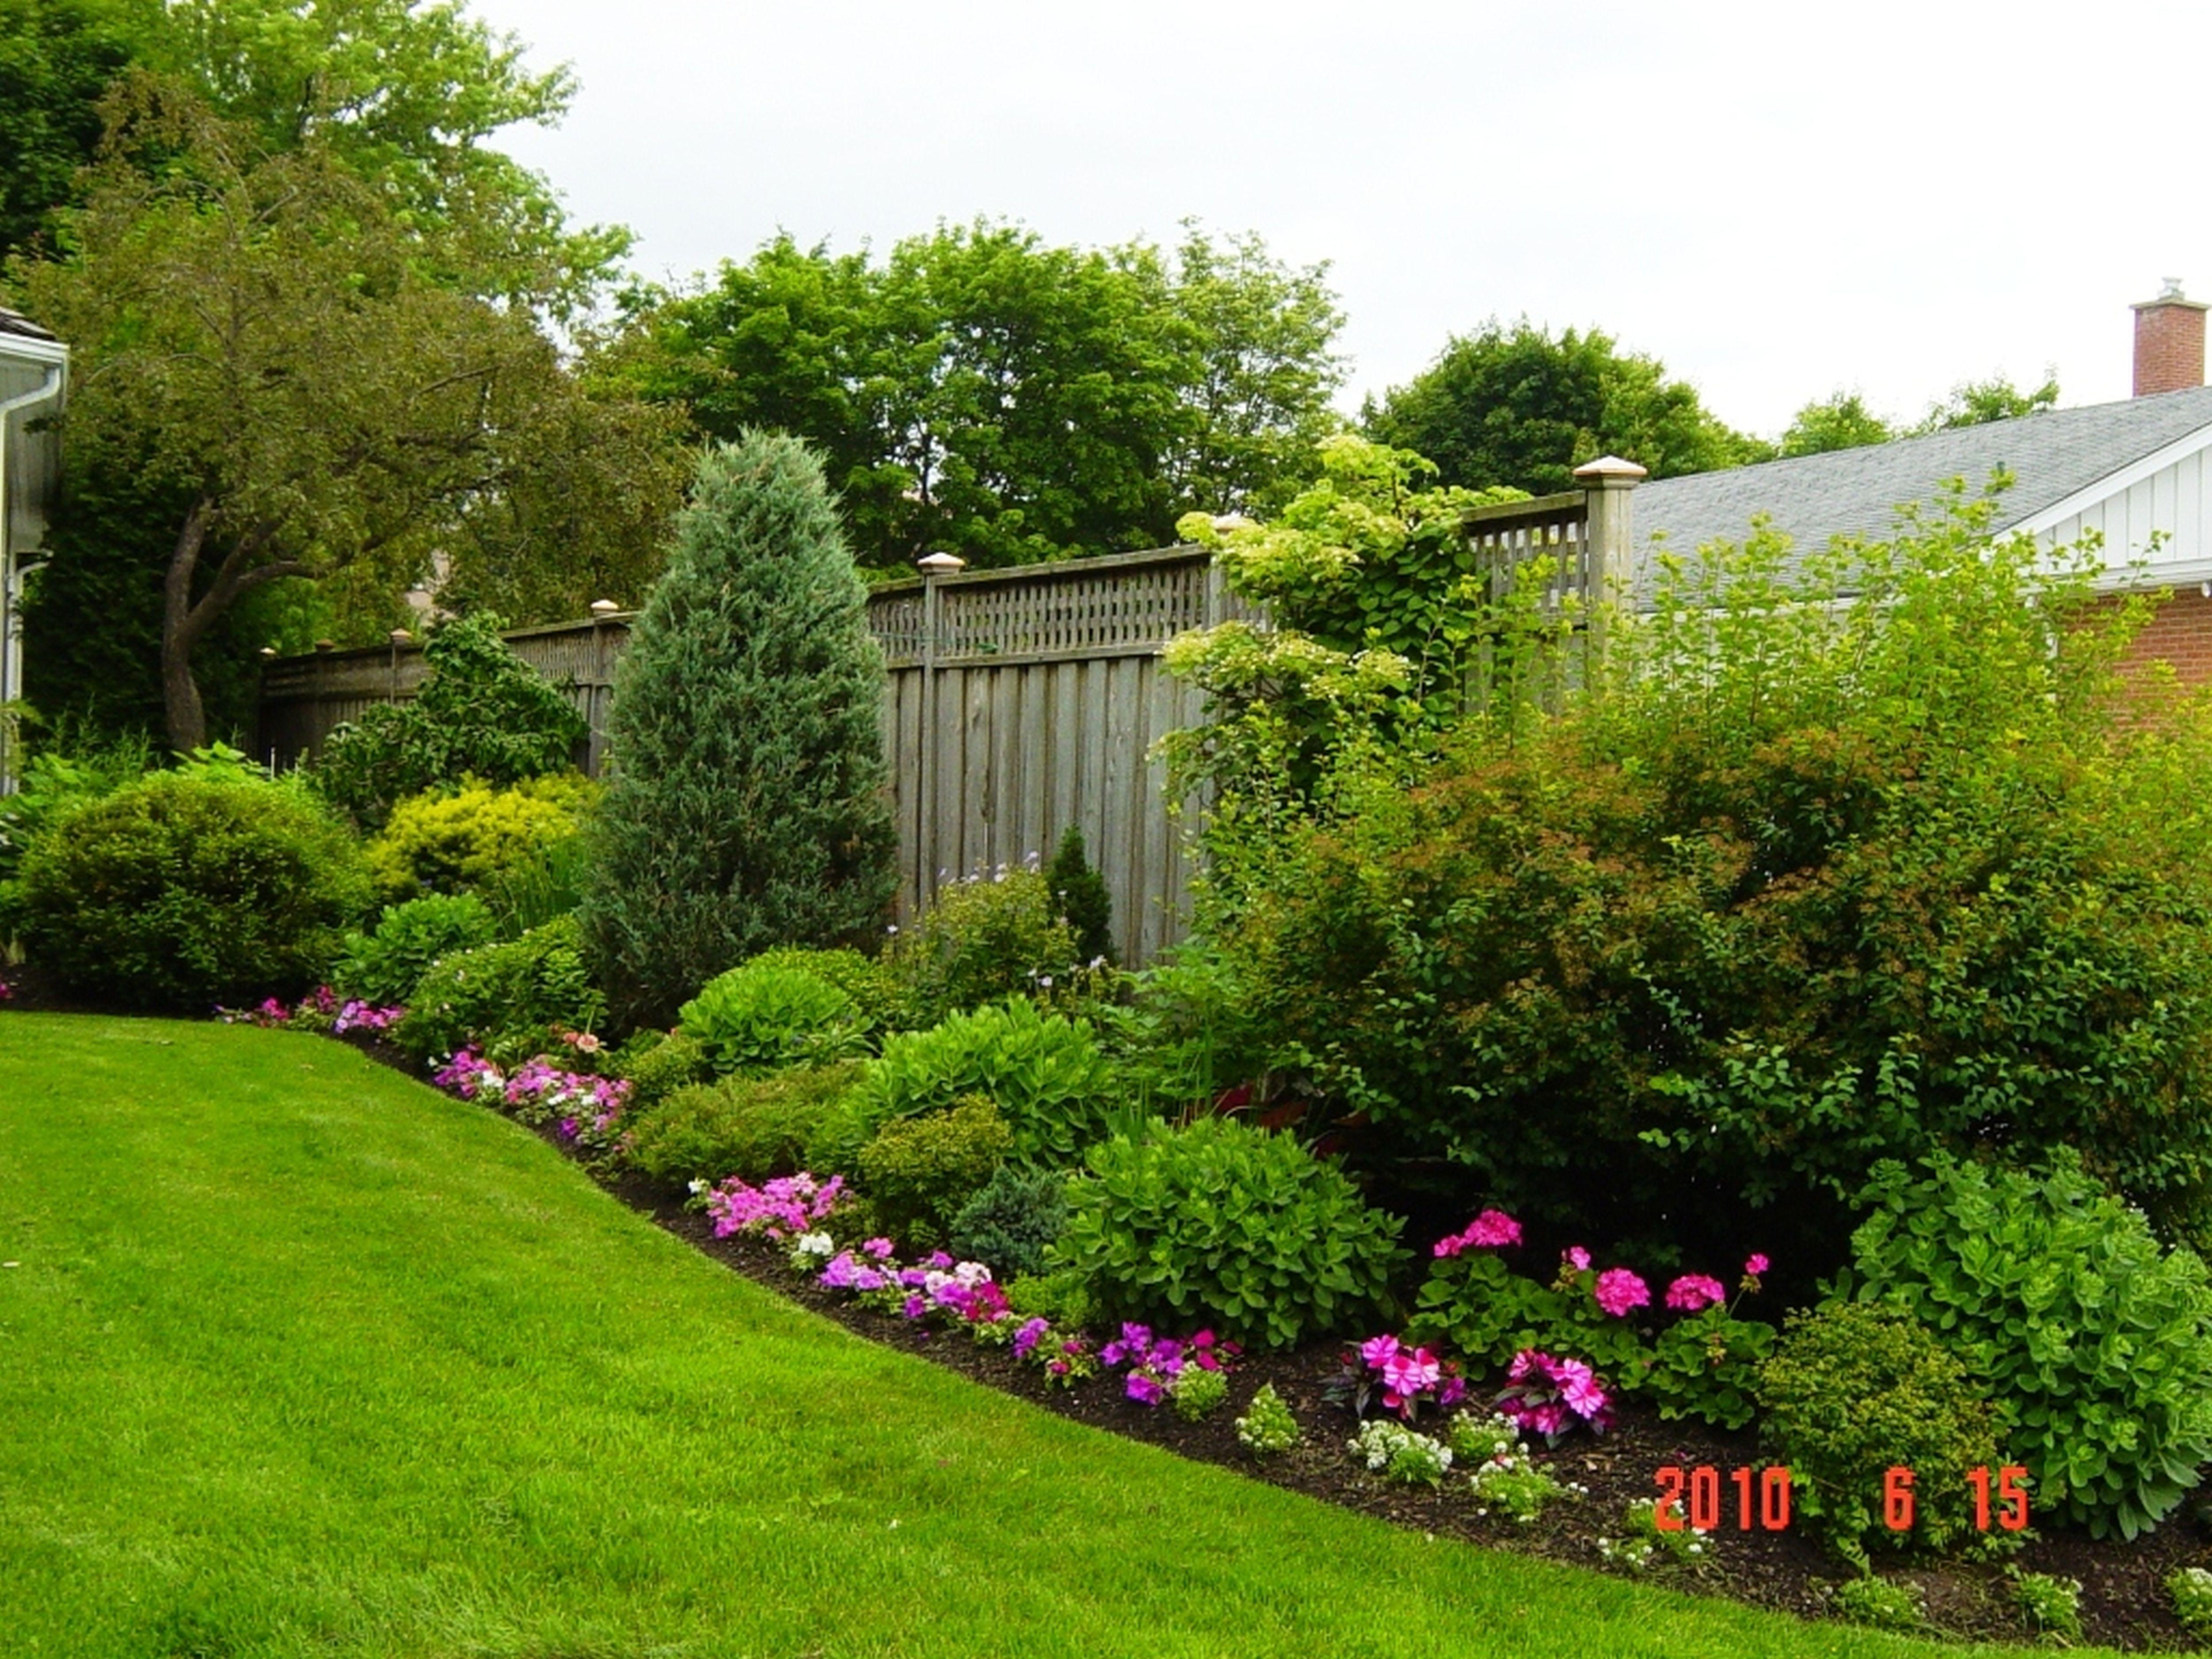 Backyard Fencing Ideas - HomesFeed on Backyard Wooden Fence Decorating Ideas  id=34641